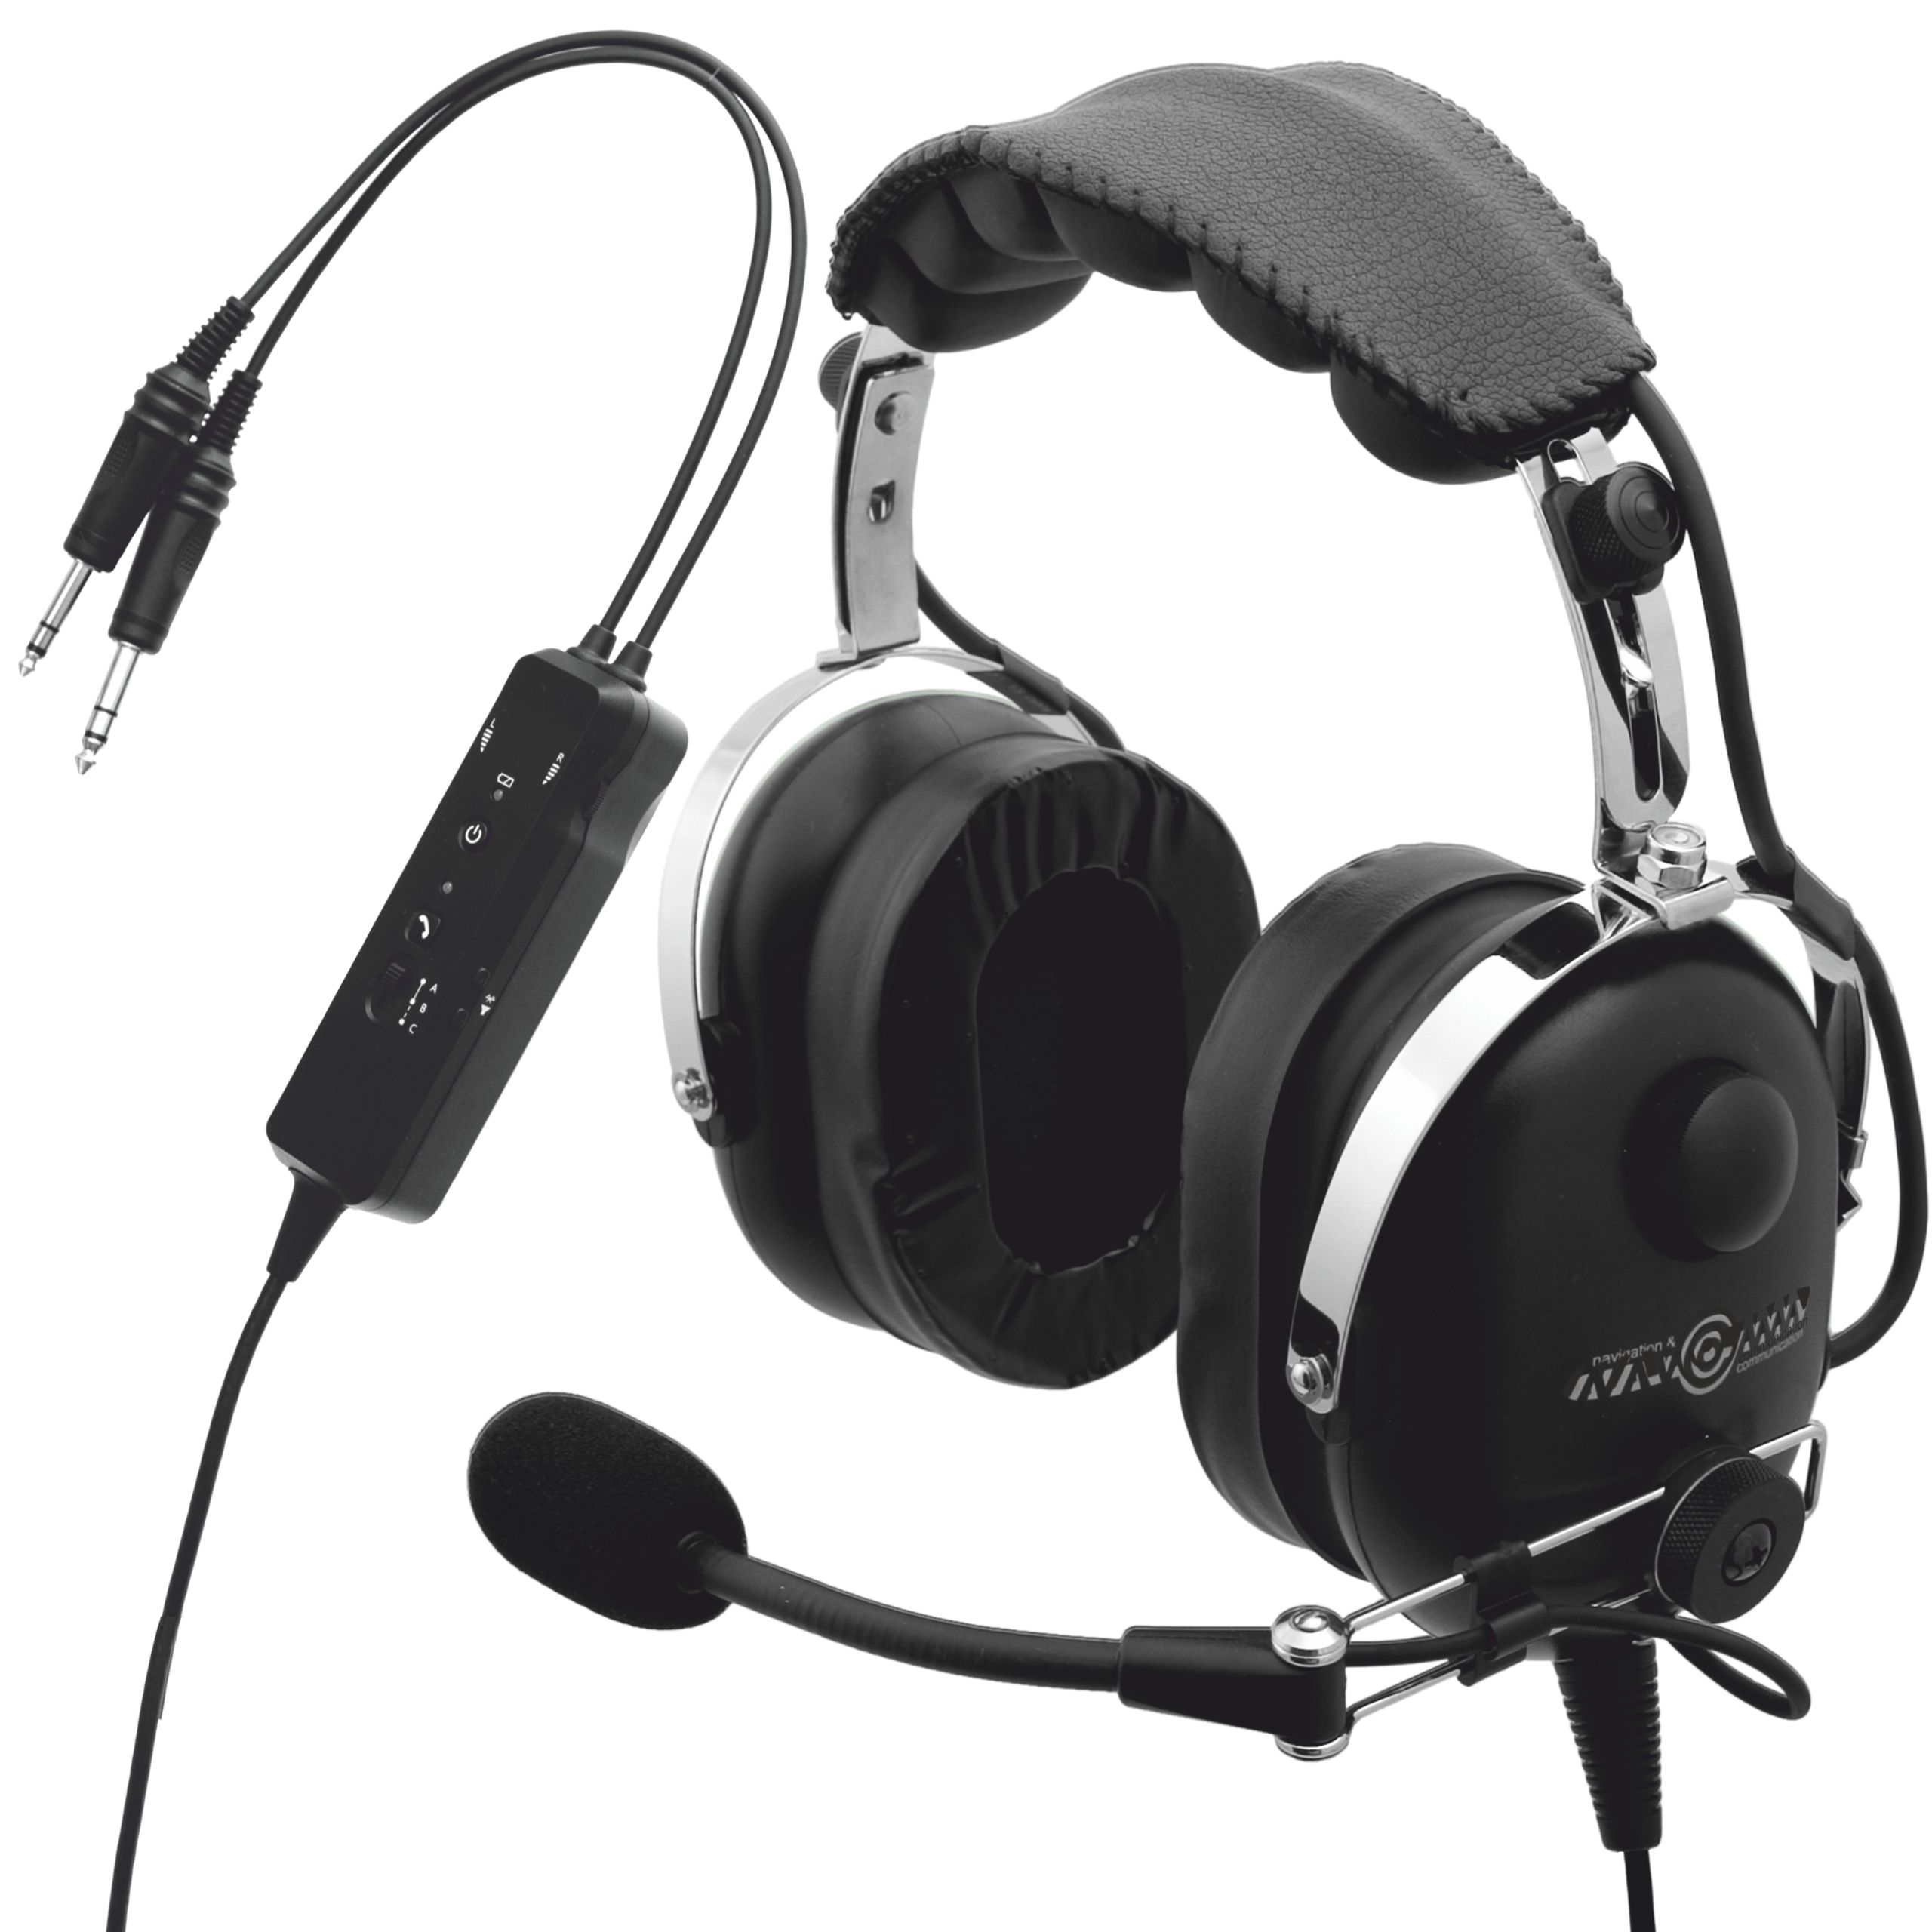 Letecké slúchadlá, Bluetooth + ANR, NAVCOMM IN